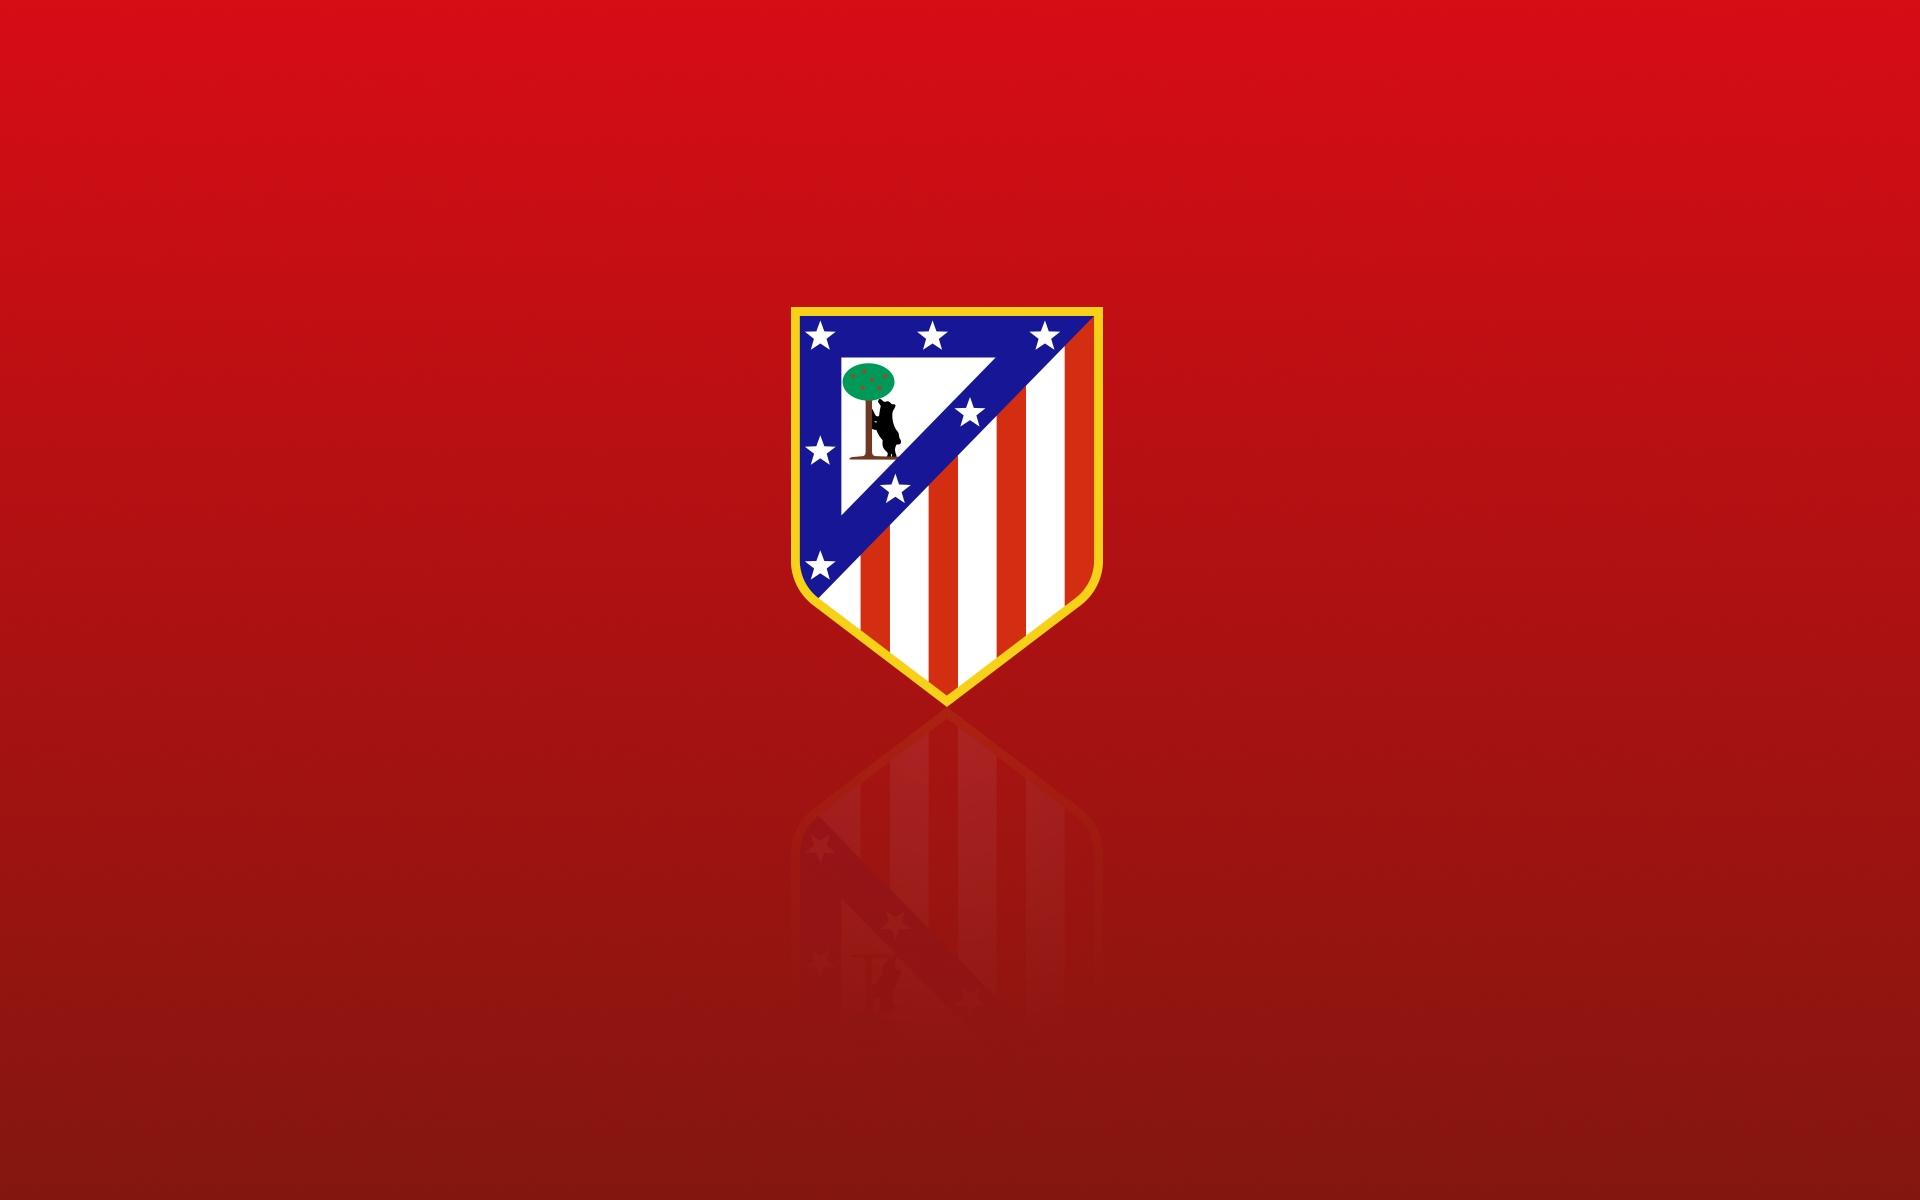 Atl233tico Madrid Logos Download 1920x1200